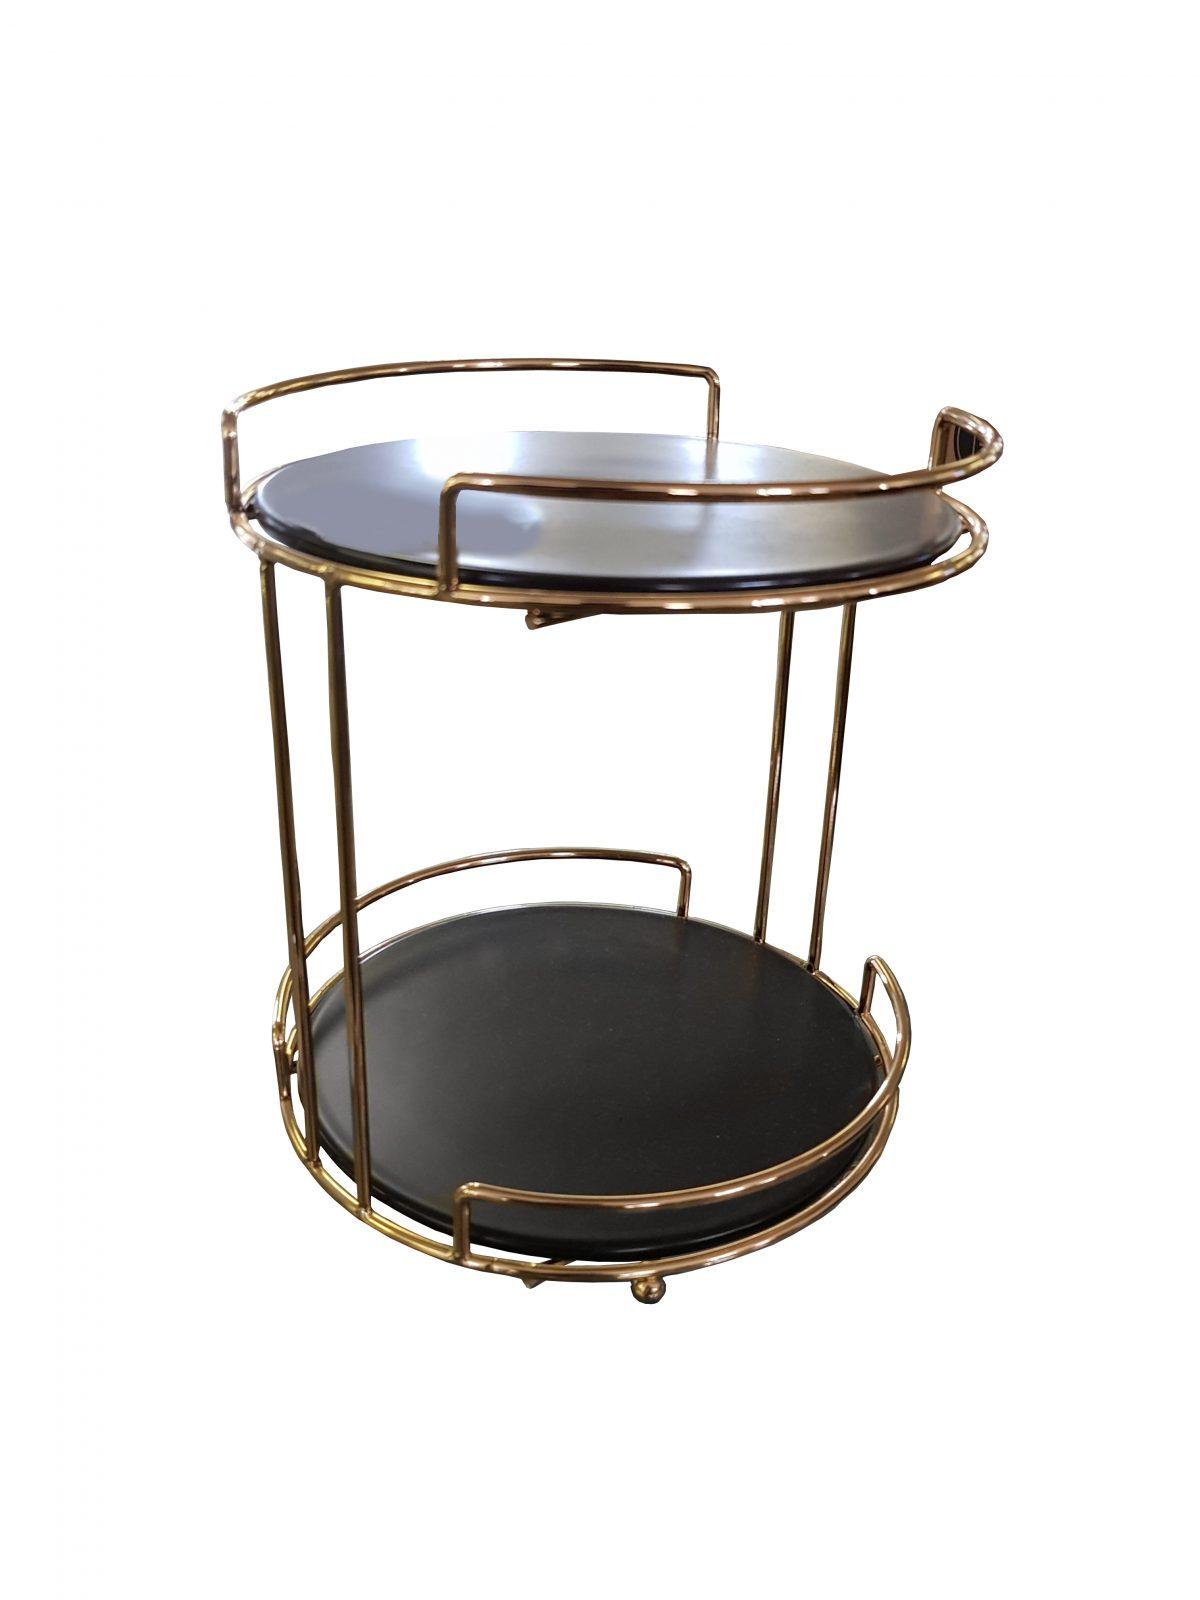 Cake Stand 2t Black Top 23.5cm